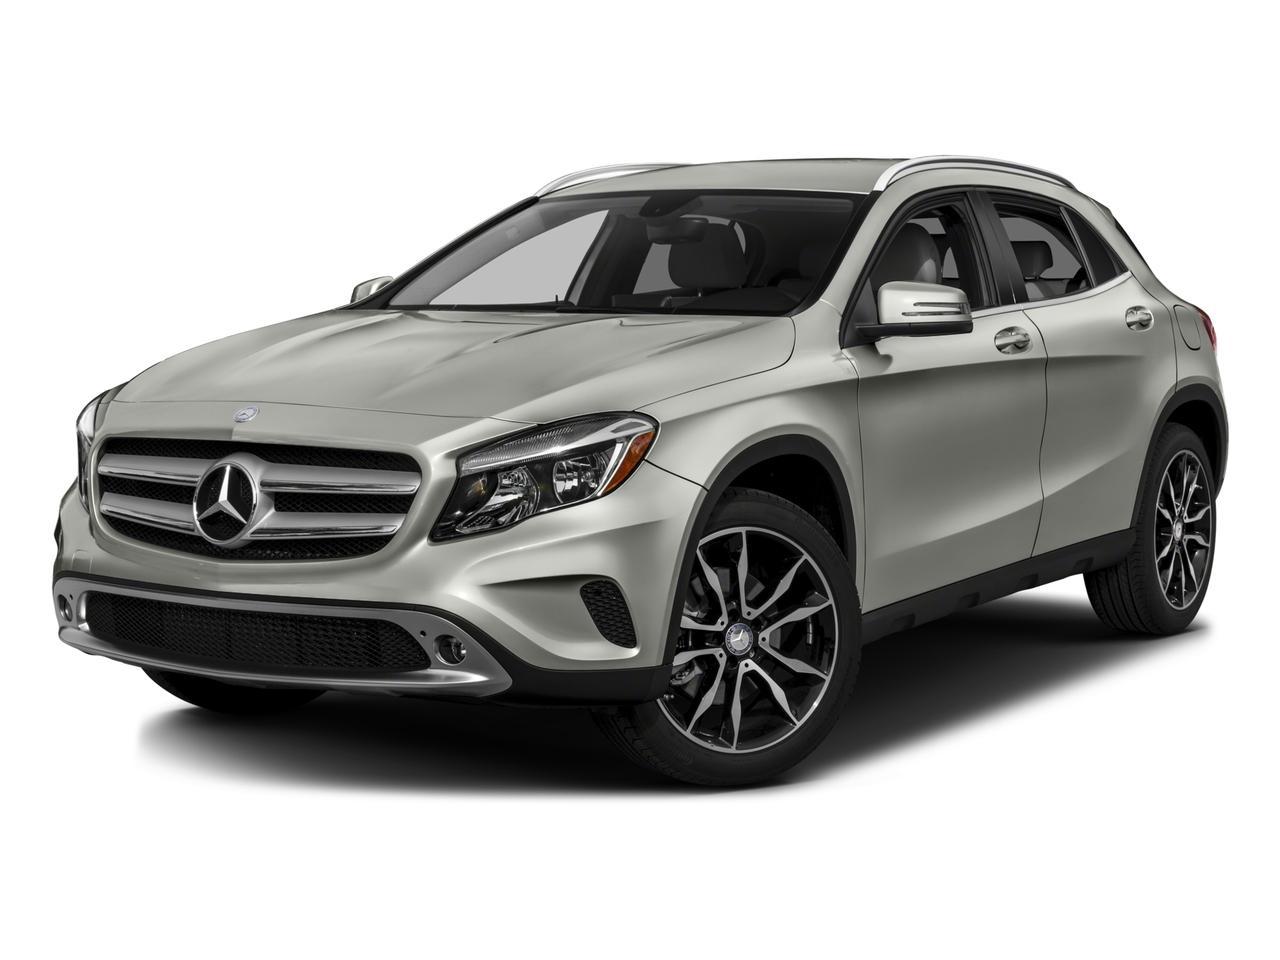 2016 Mercedes-Benz GLA Vehicle Photo in Portland, OR 97225